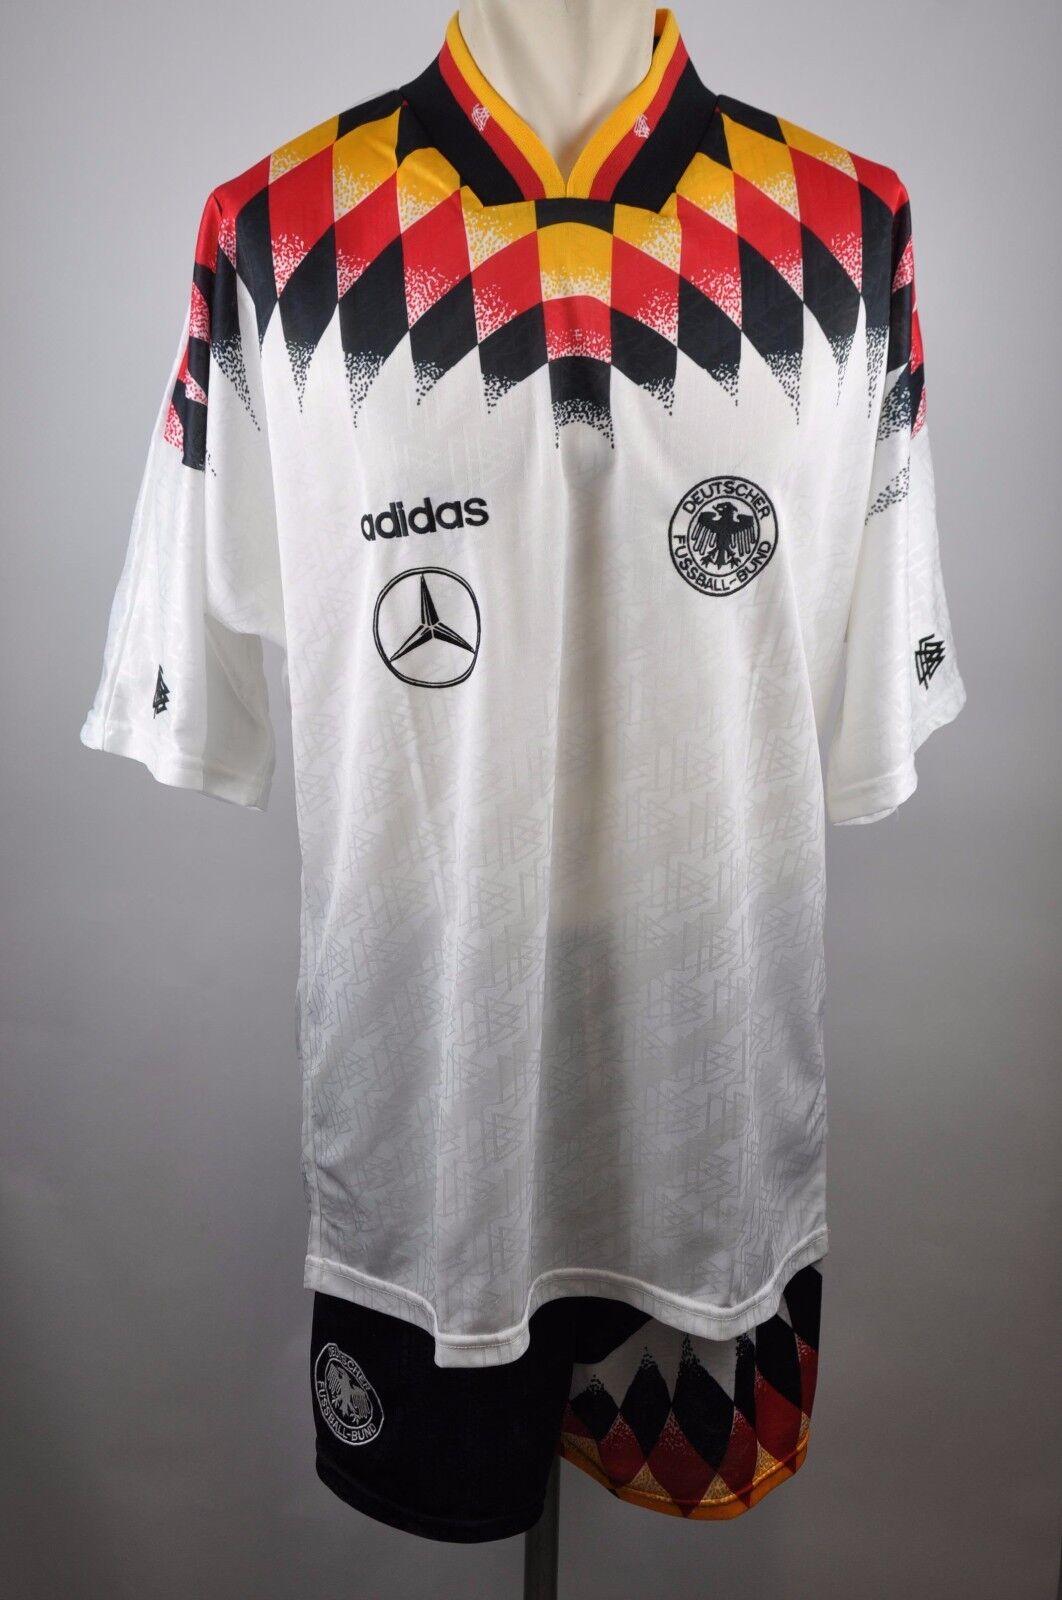 Deutschland DFB Trikot Set 1994  Adidas Jersey Mercedes Gr. XL 94er DFB Germany